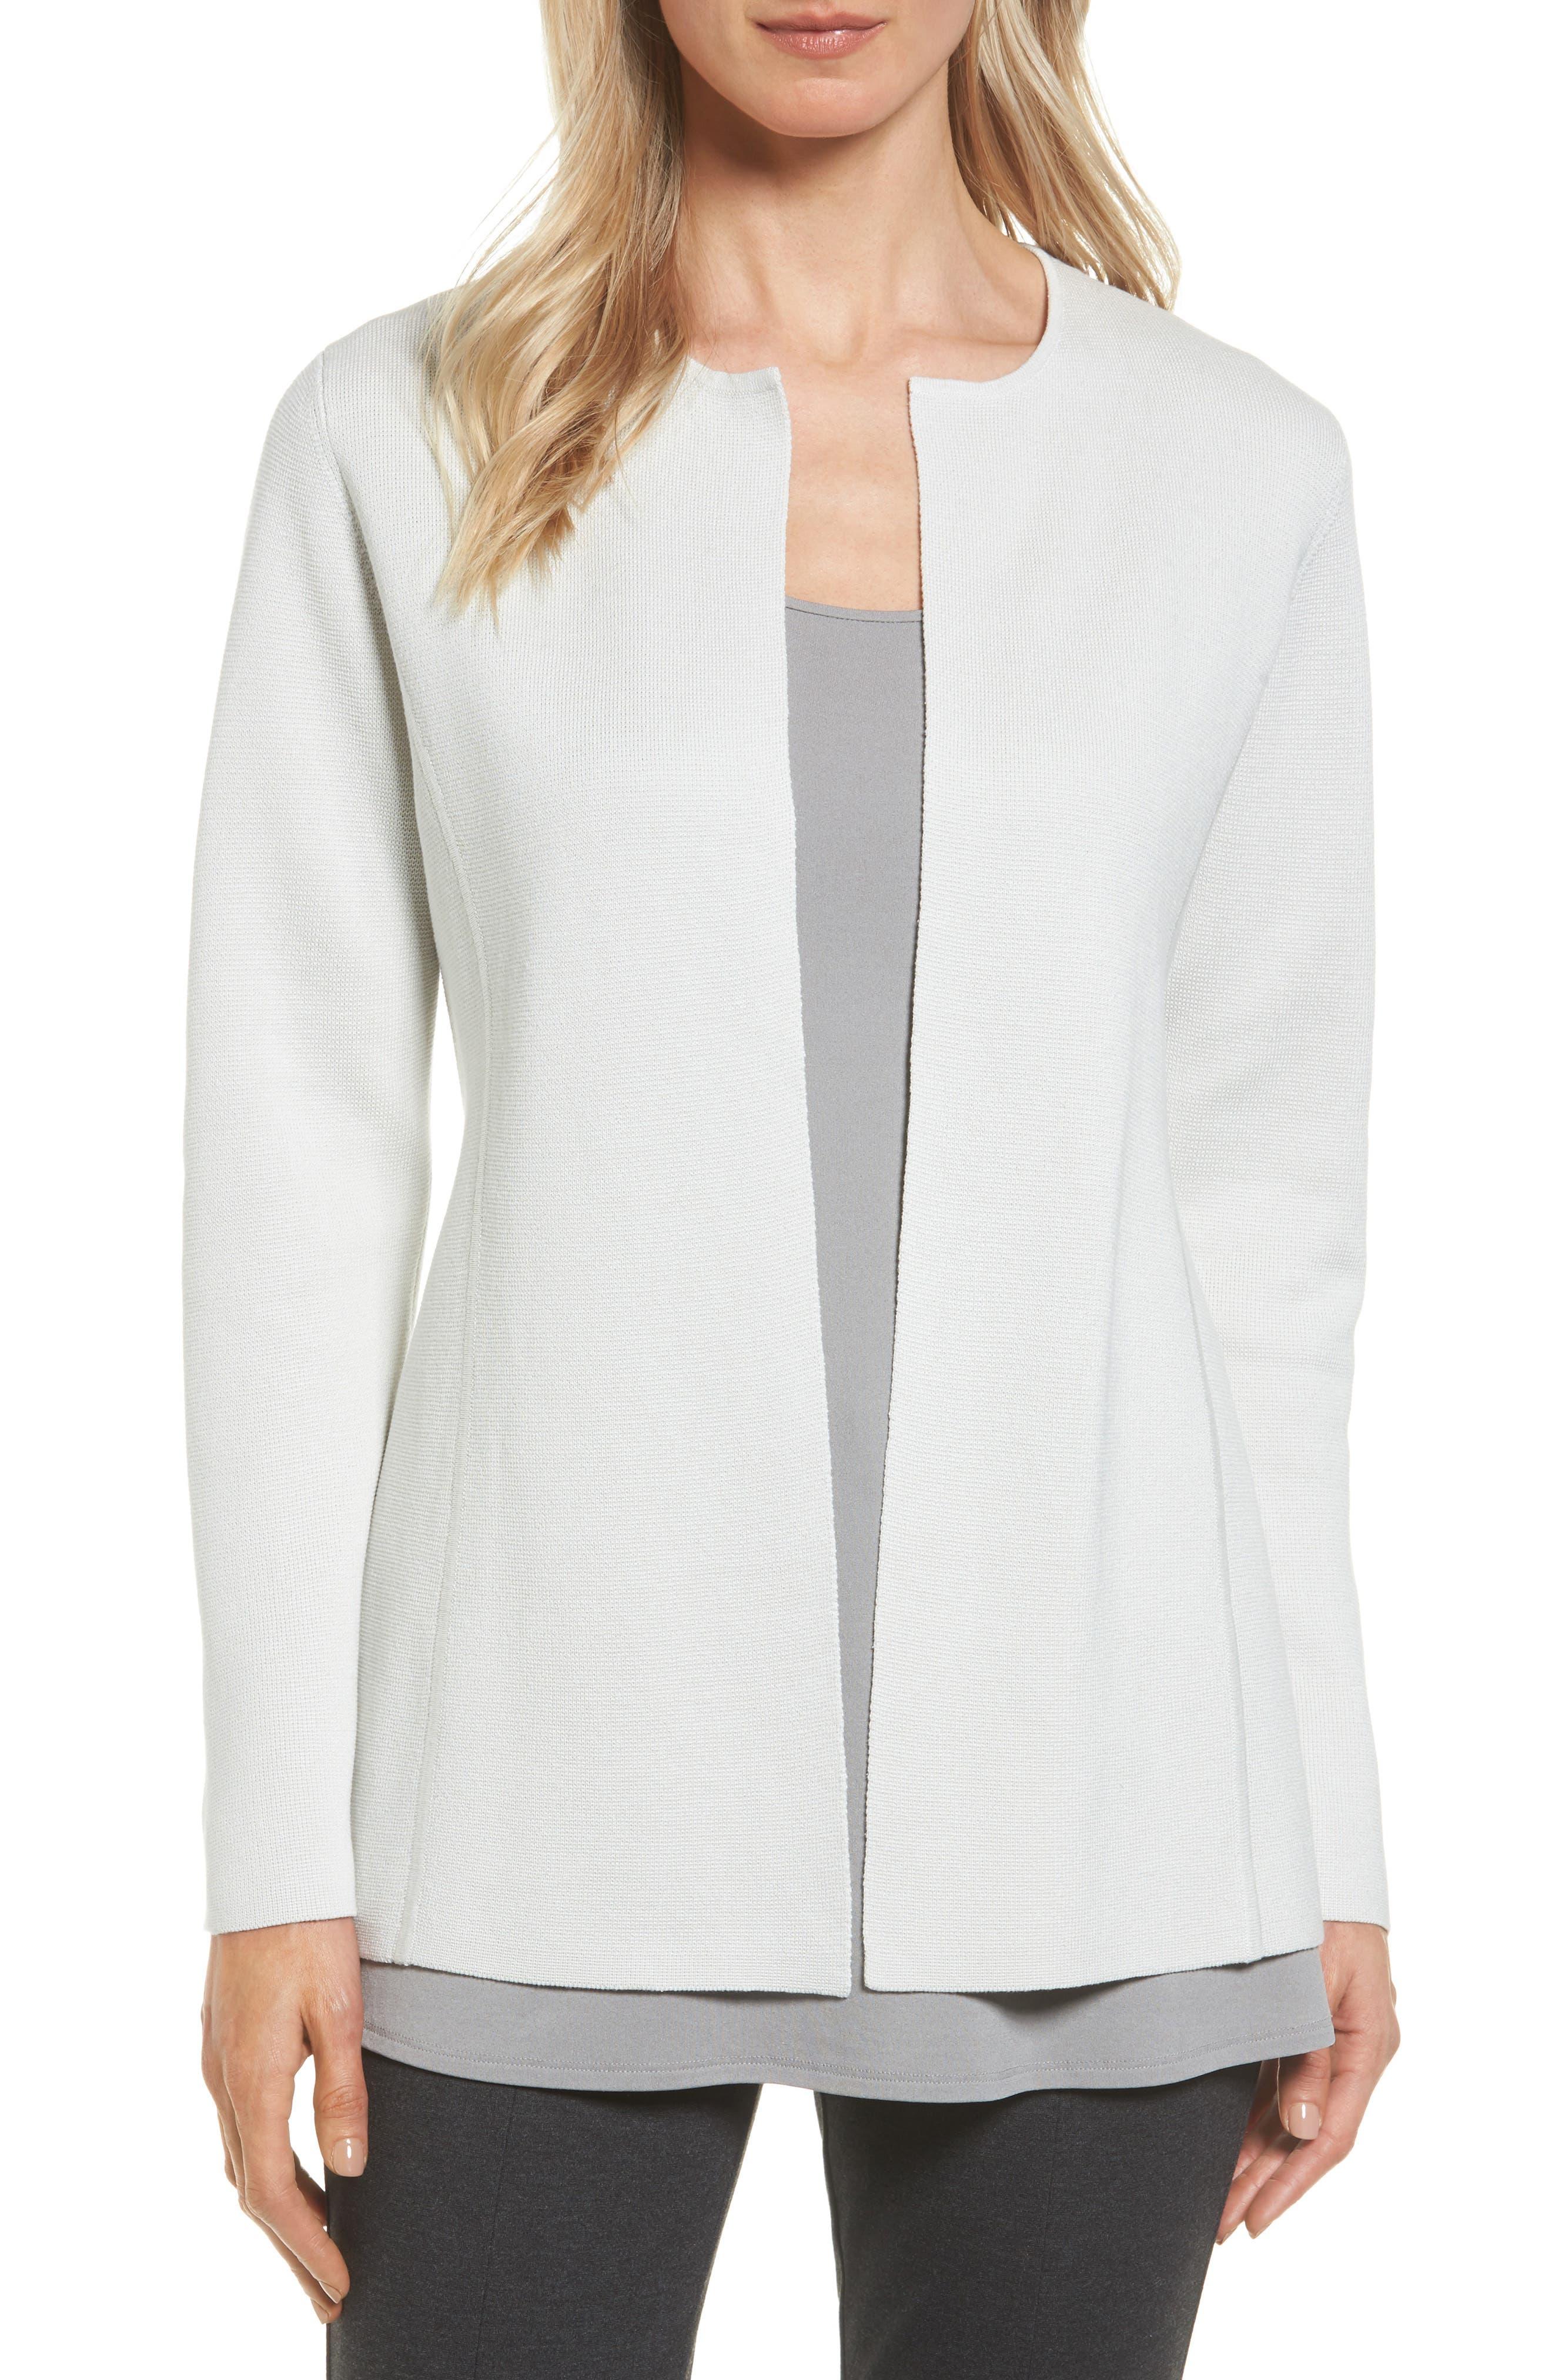 Eileen Fisher Silk & Organic Cotton Cardigan